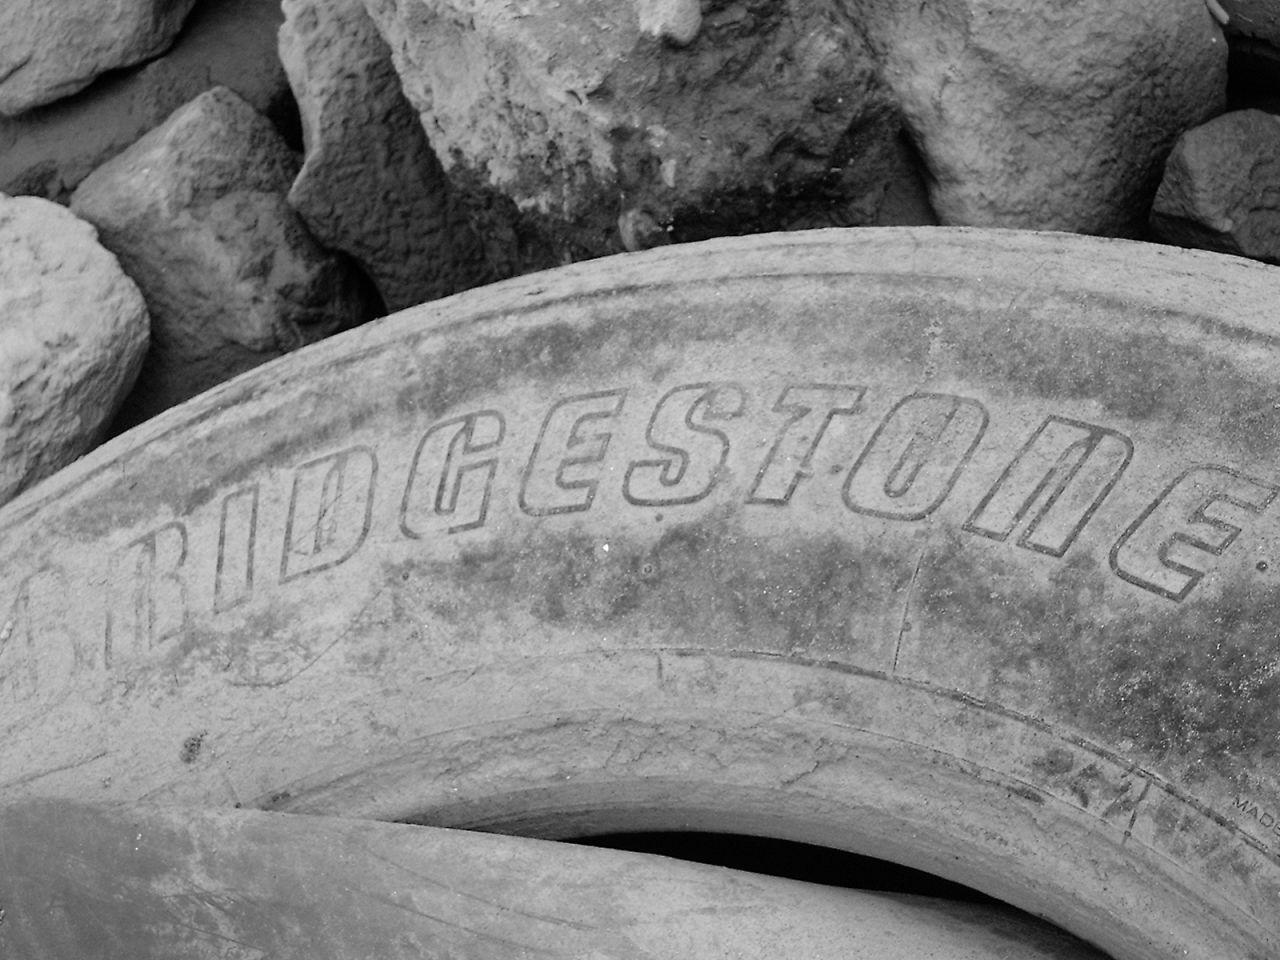 BLOG: How to Make Money Using a Tire Shredder | Waste